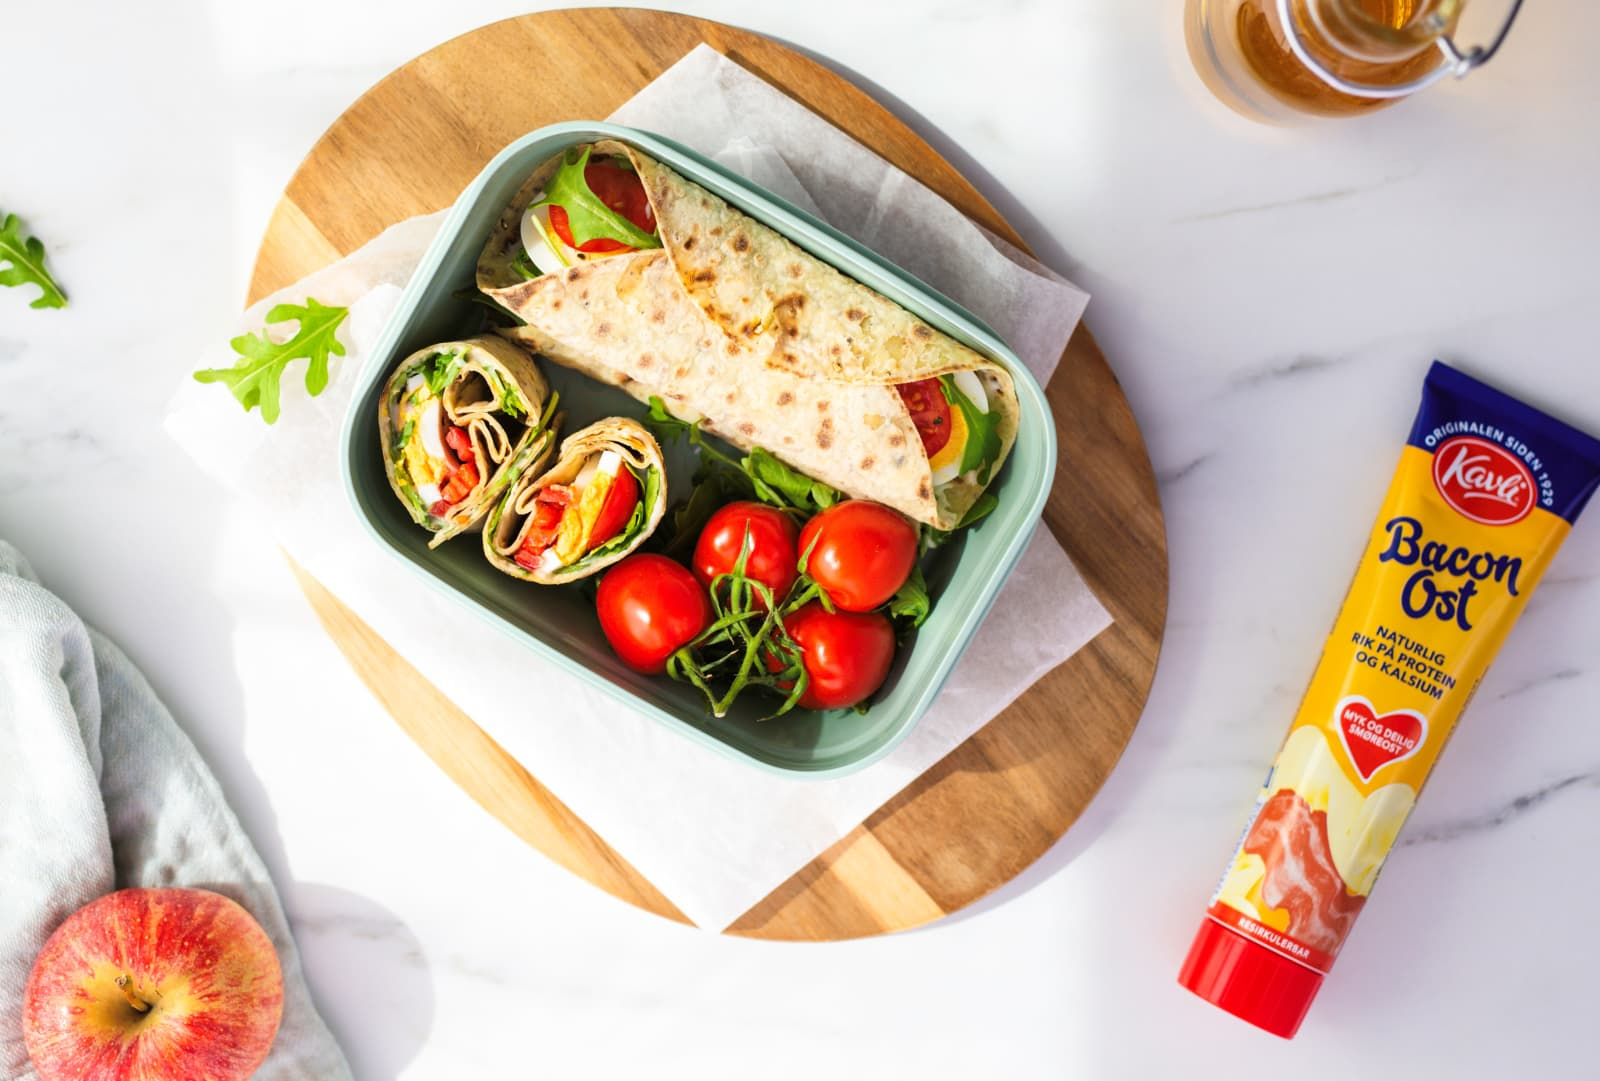 Matpakkeboks fylt med lefser med Kavli BaconOst, kokt egg, tomat og spinat.